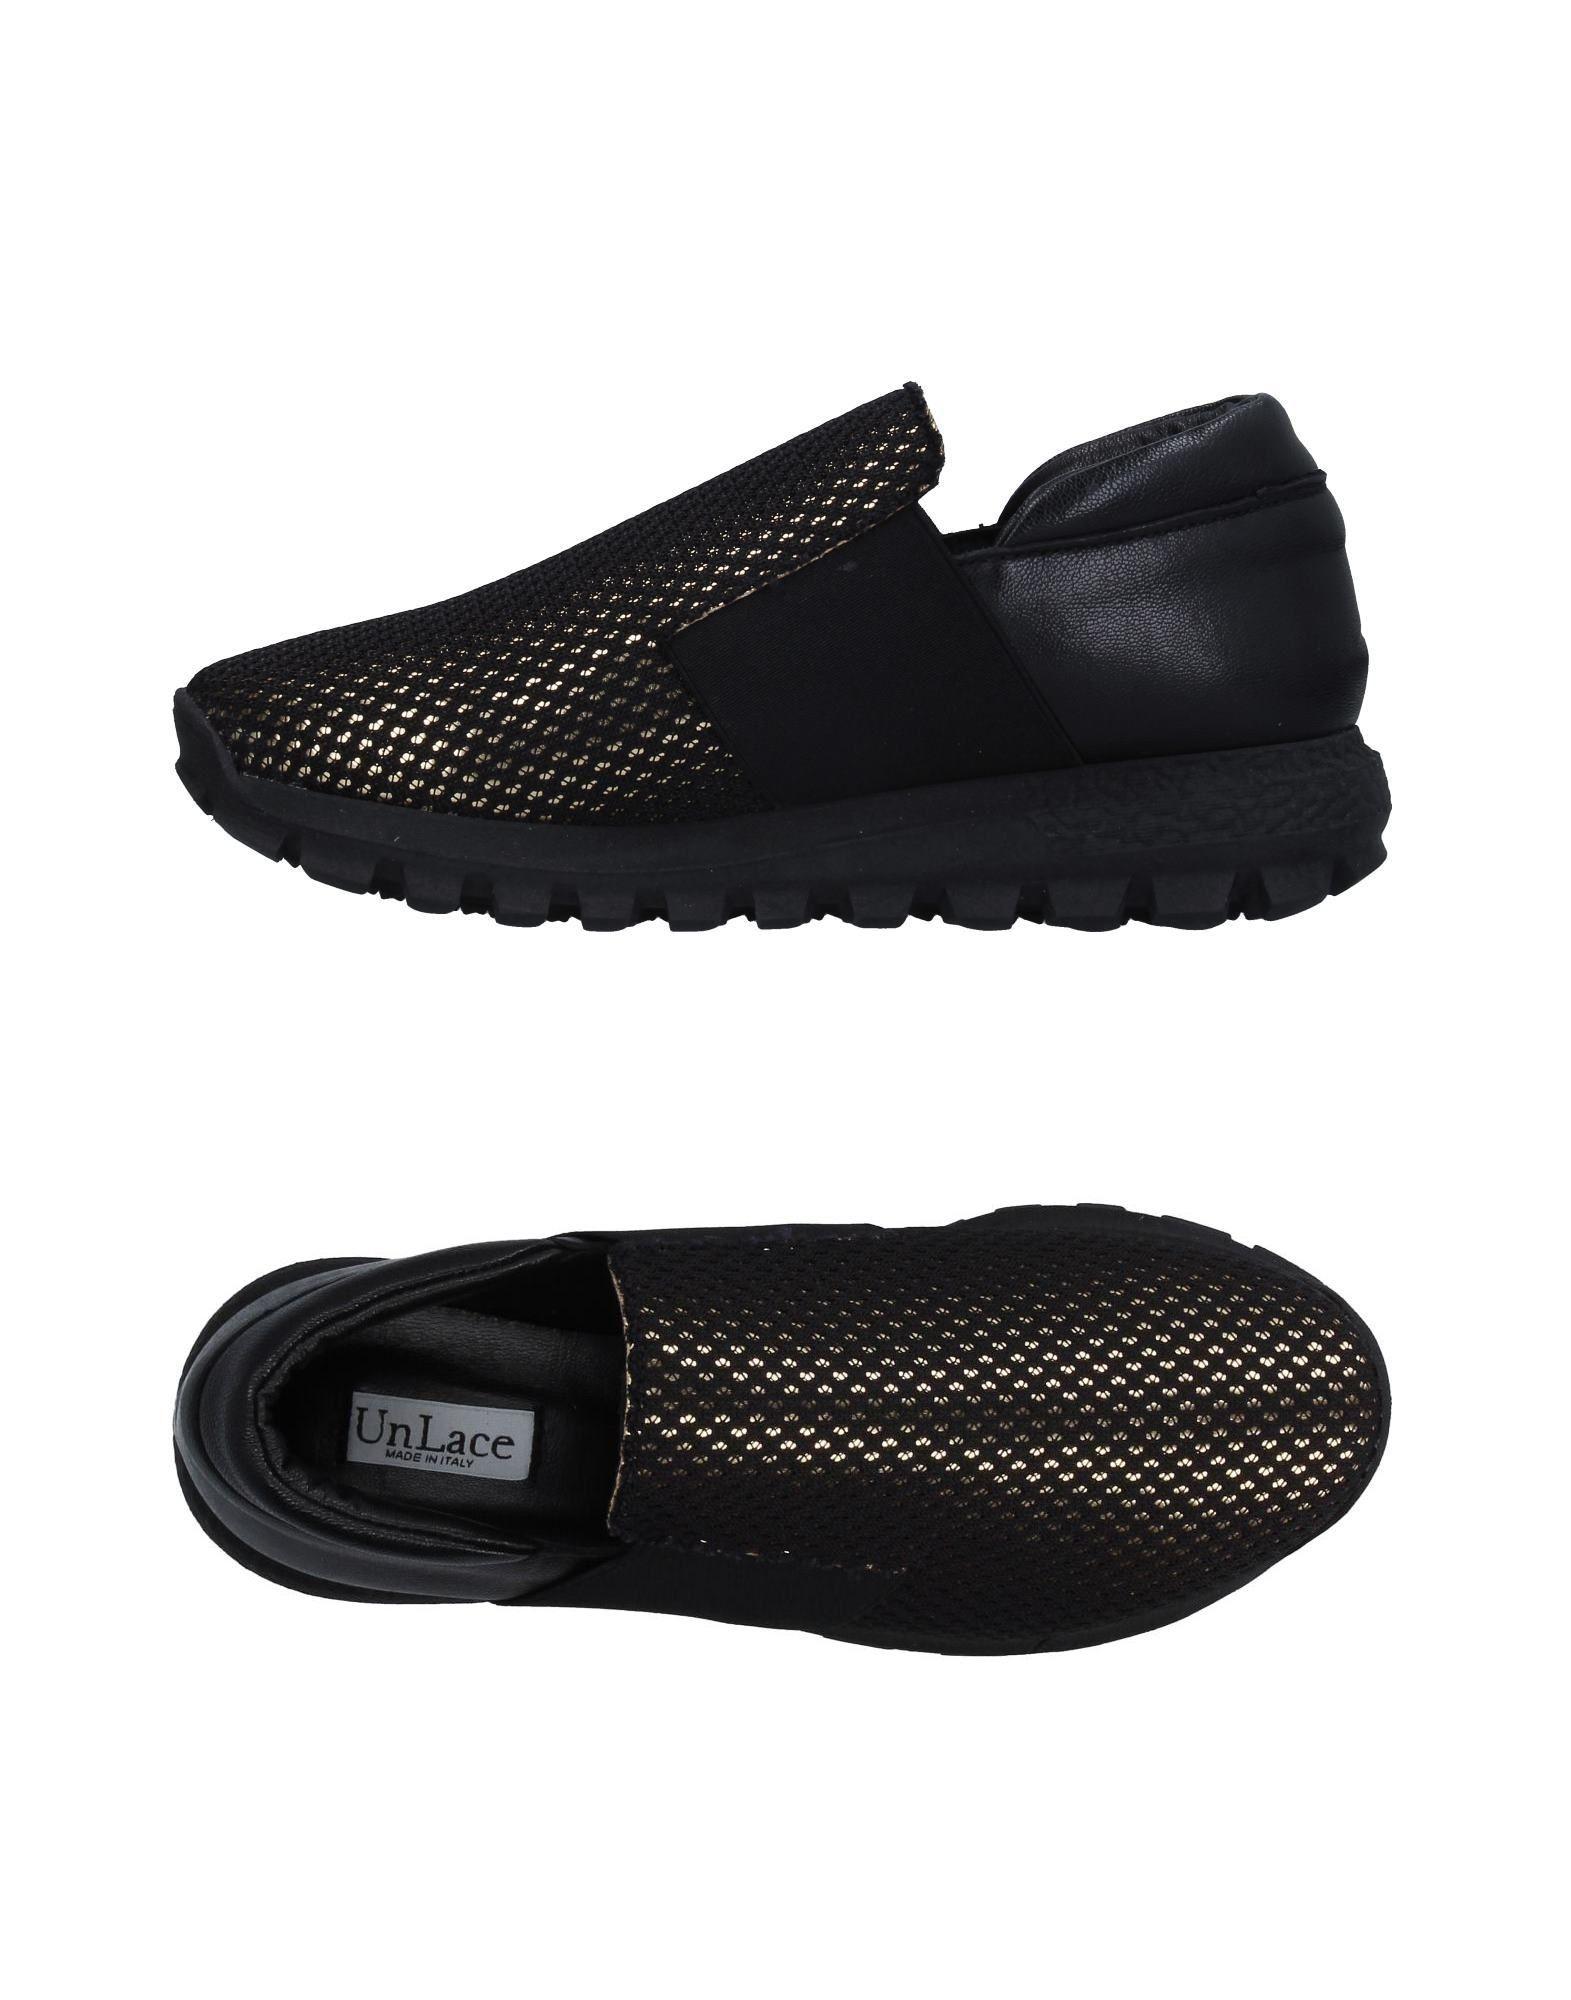 Unlace Sneakers Damen  11285258PE Gute Qualität beliebte Schuhe